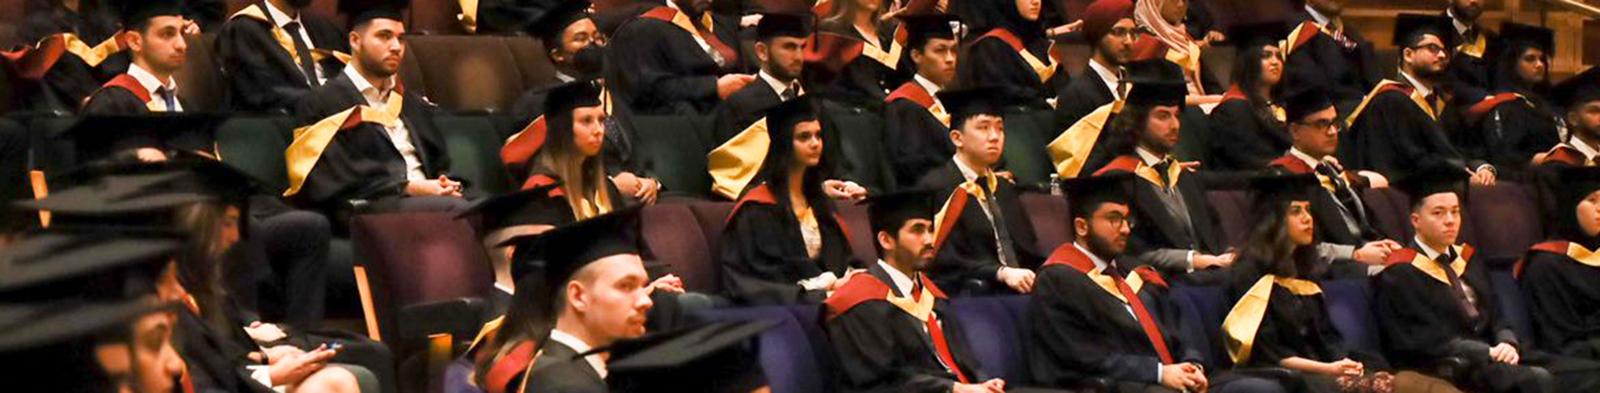 Professor Caroline Wiertz standing behind a lectern in graduation gown and hat